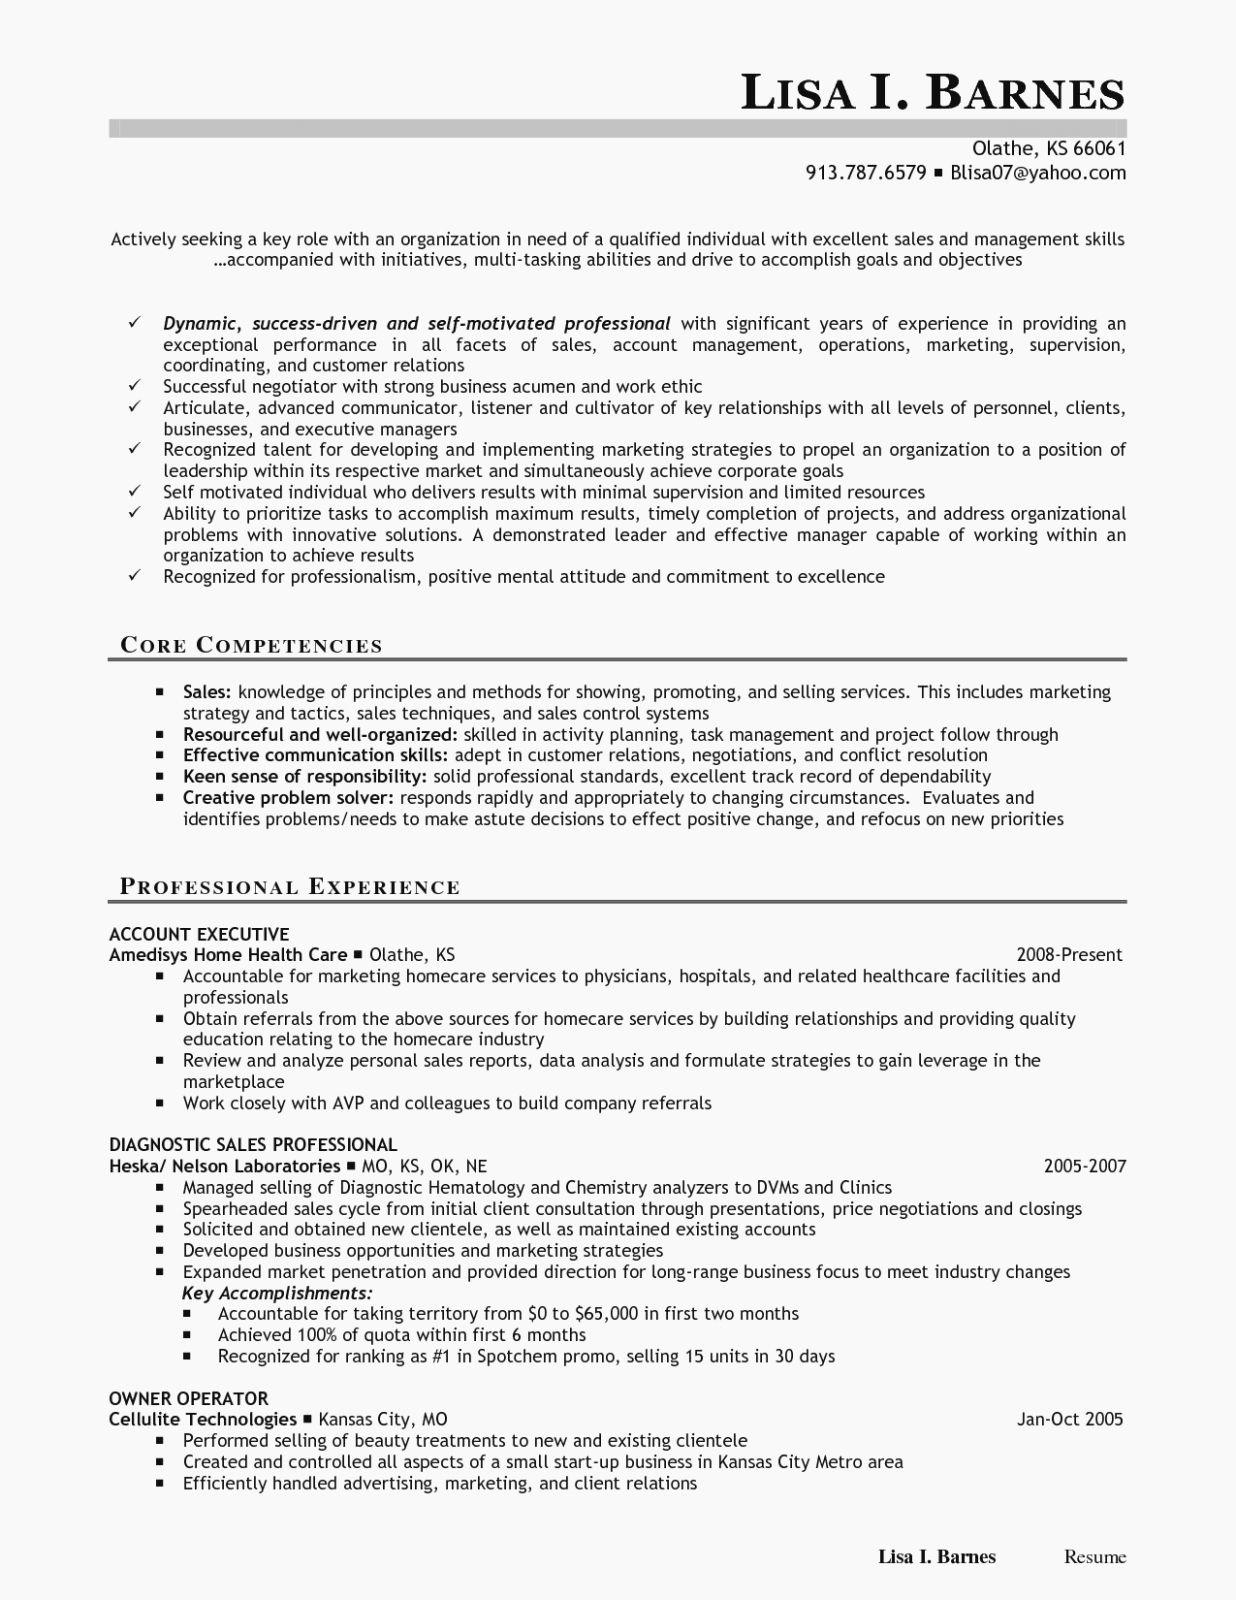 Entry Level Sales Resume Elegant Ten Things You Probably Sales Resume Sales Resume Examples Pharmaceutical Sales Resume Entry level pharmaceutical sales cover letter